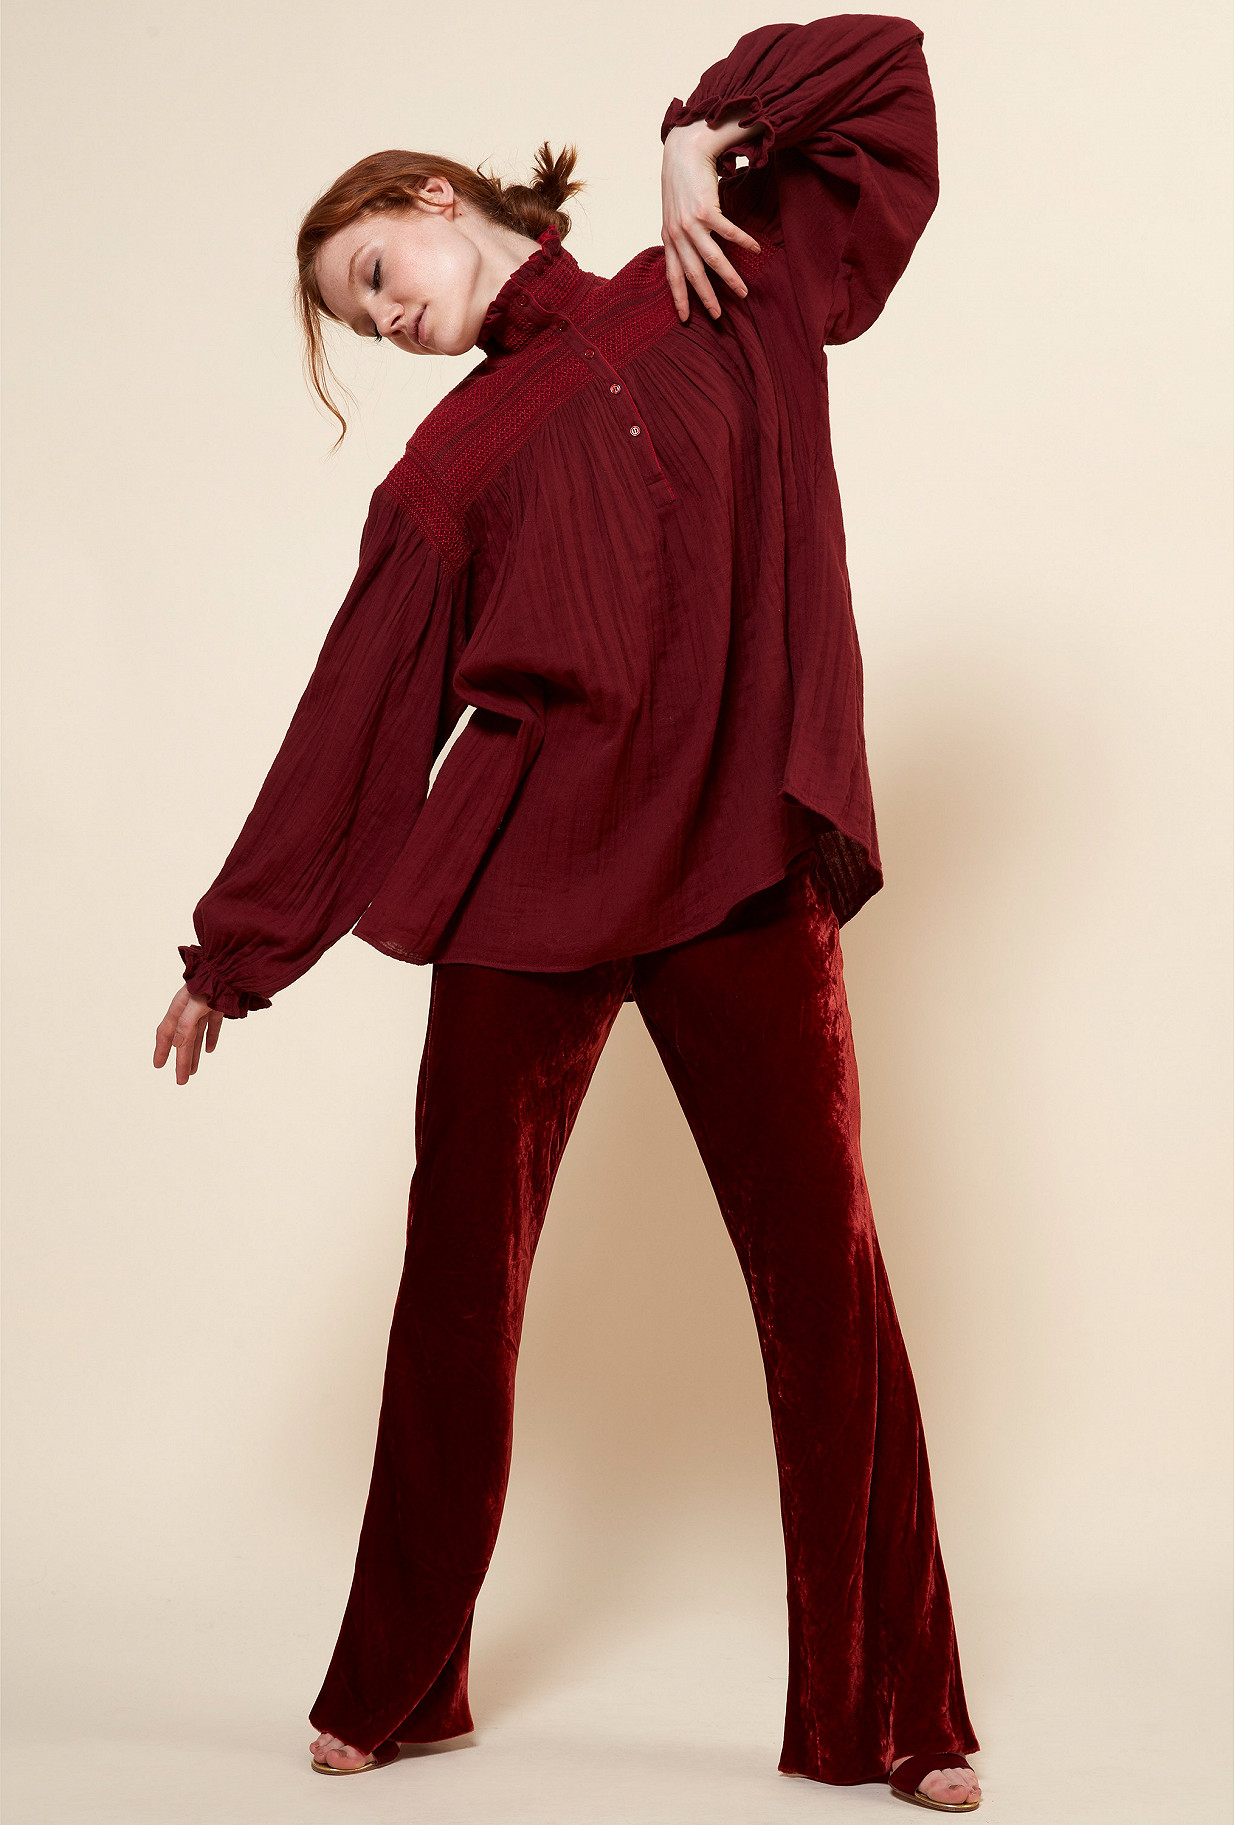 Paris clothes store Blouse Tartuffe french designer fashion Paris